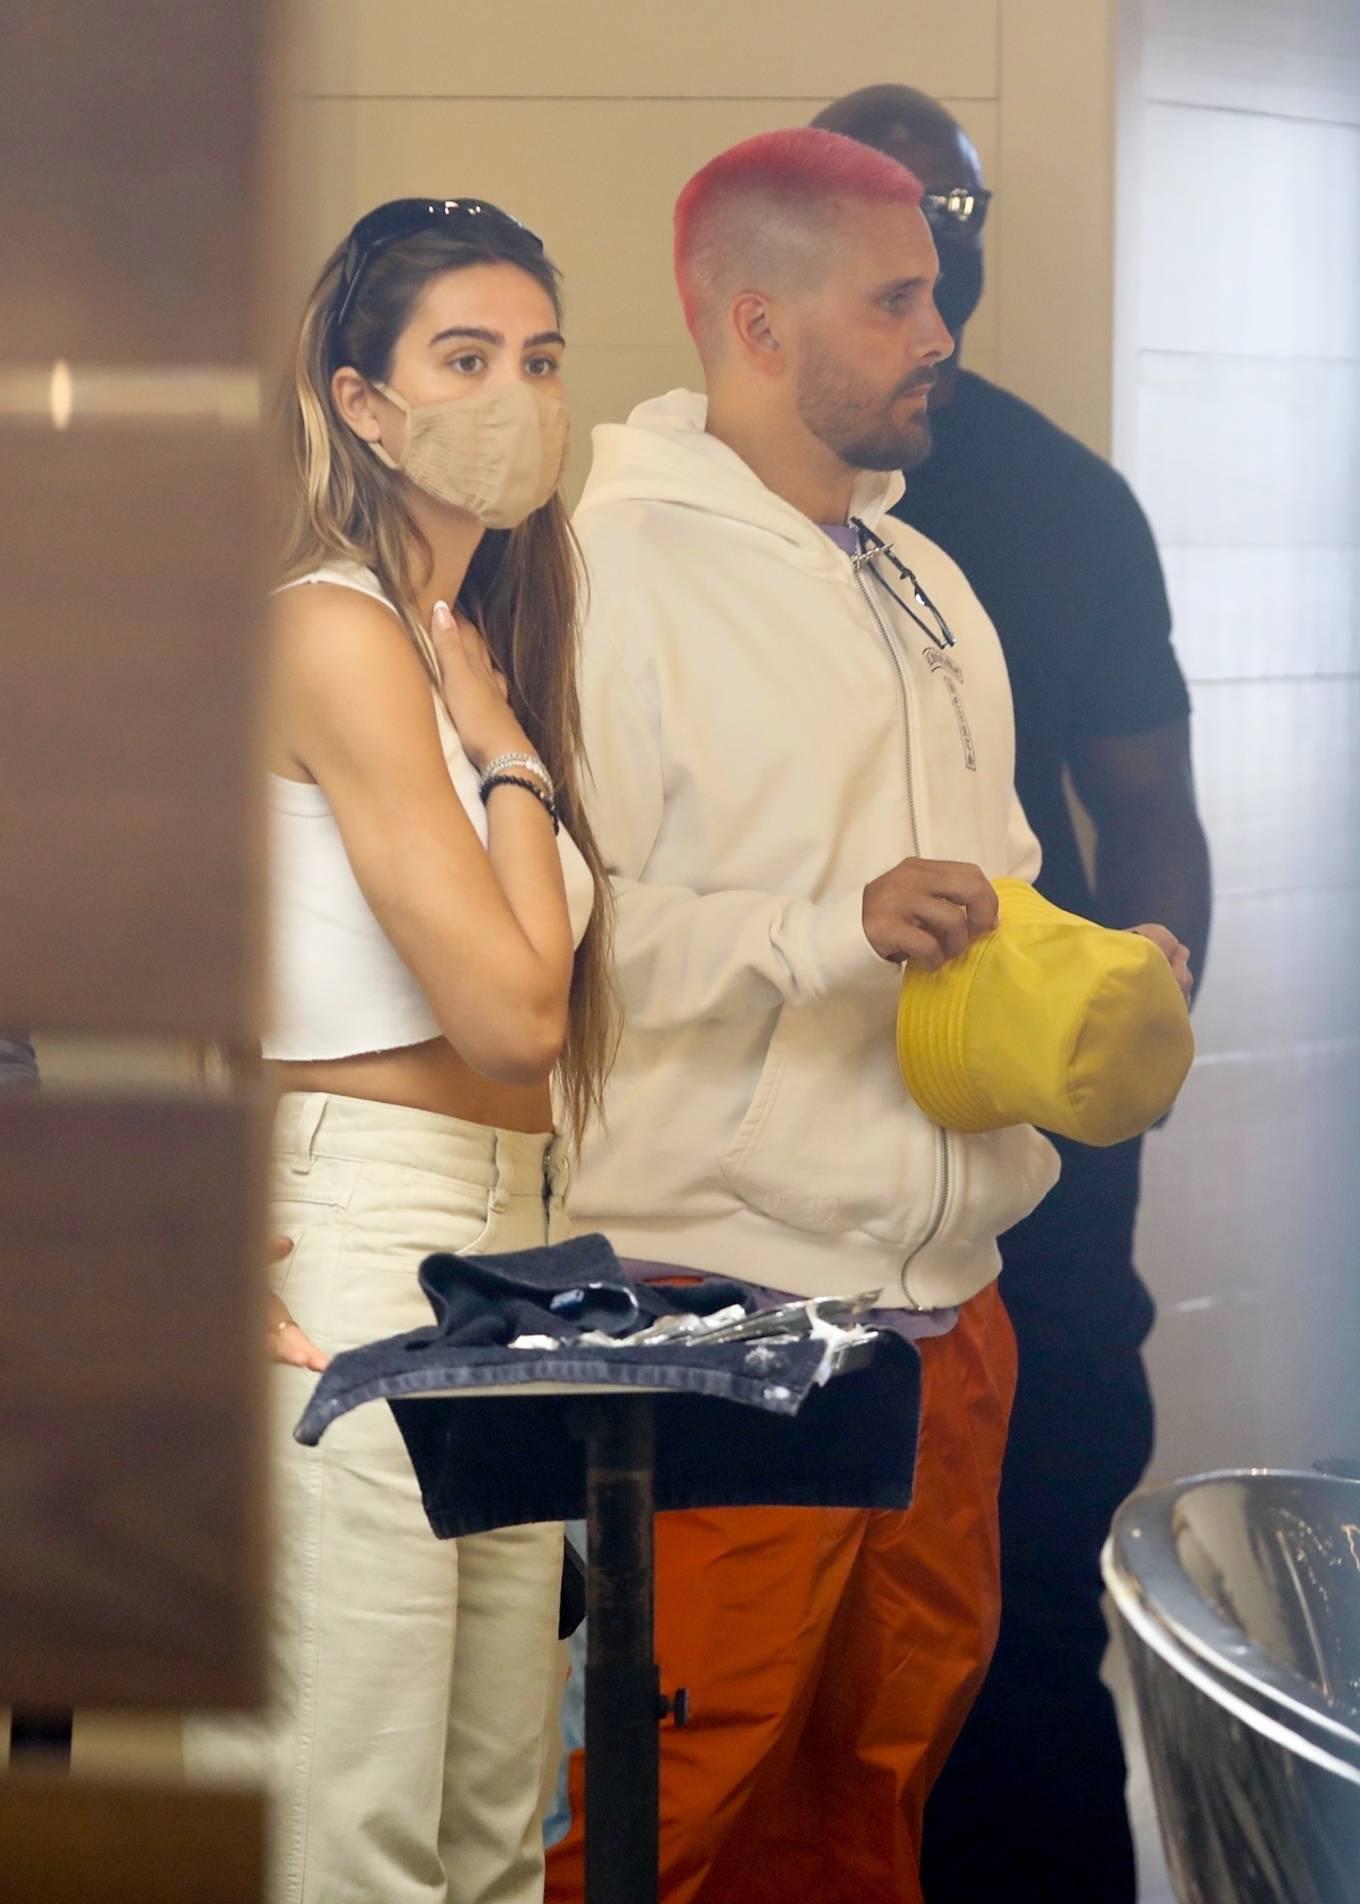 Amelia Hamlin 2021 : Amelia Hamlin – Seen with Scott Disick as they visit Meche Salon in Beverly Hills-17